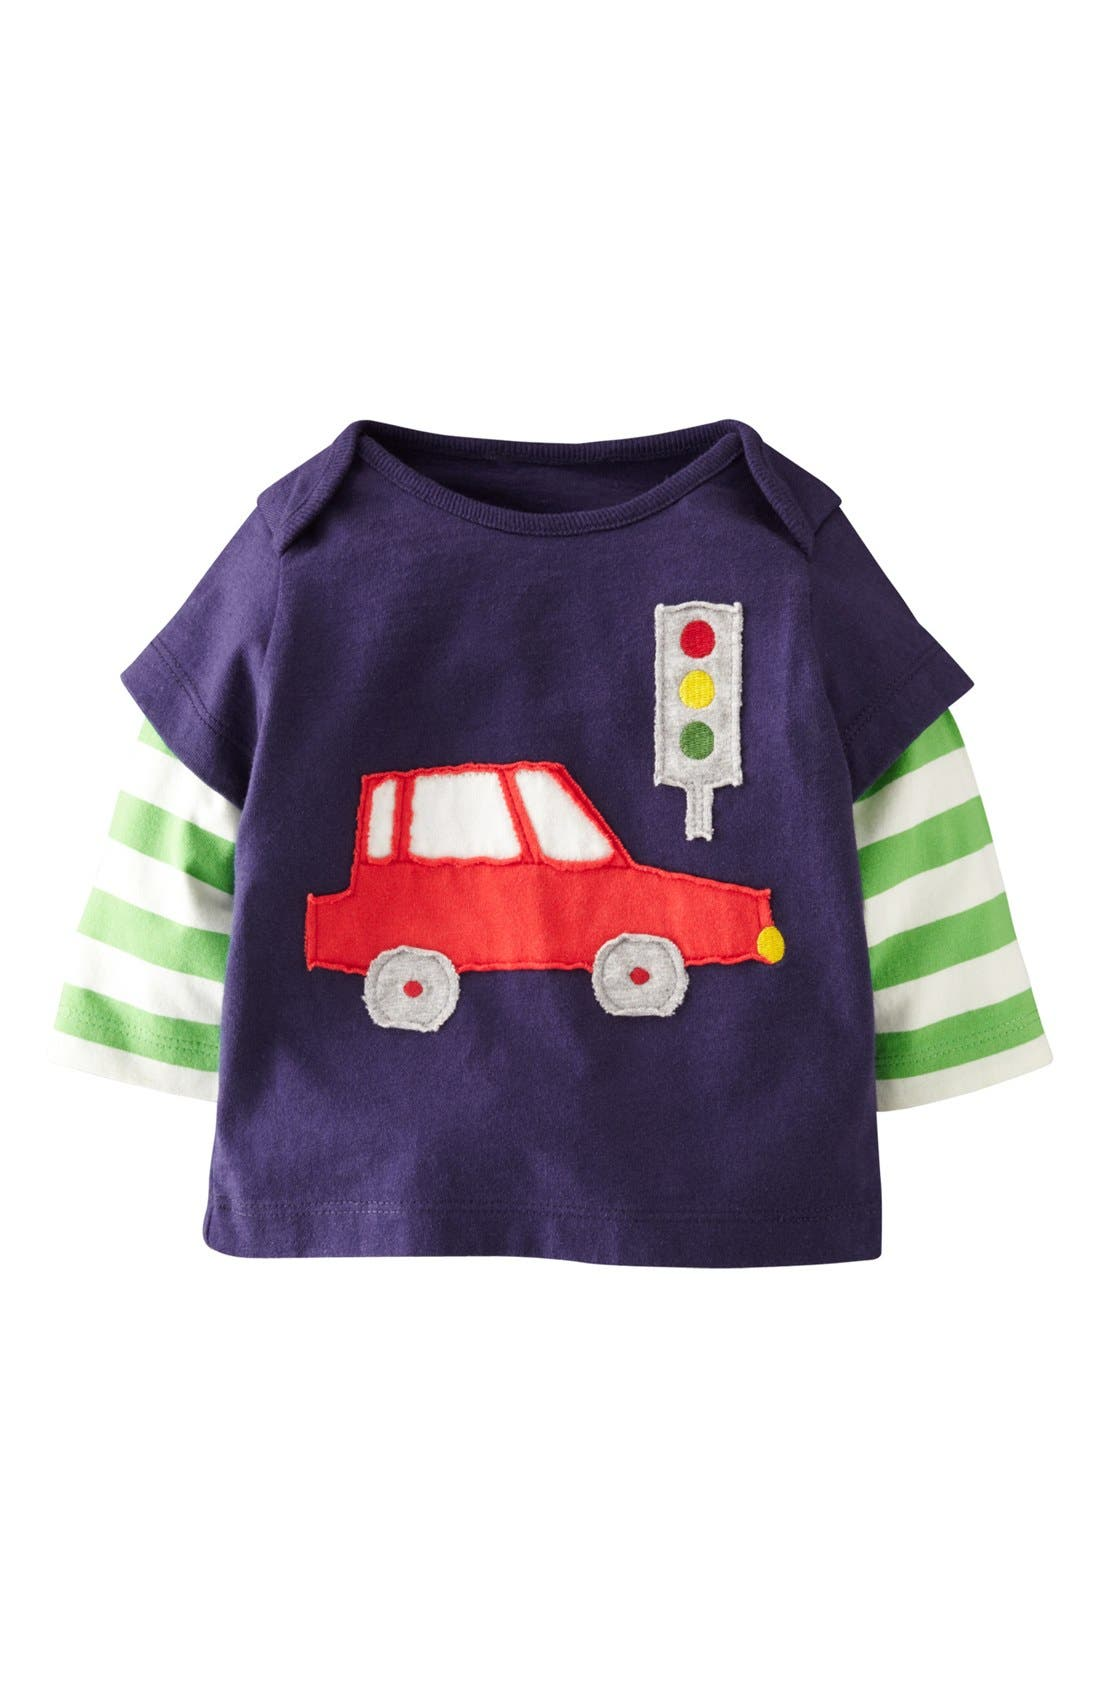 Main Image - Mini Boden 'London' Appliqué Layered Sleeve T-Shirt (Baby Boys)